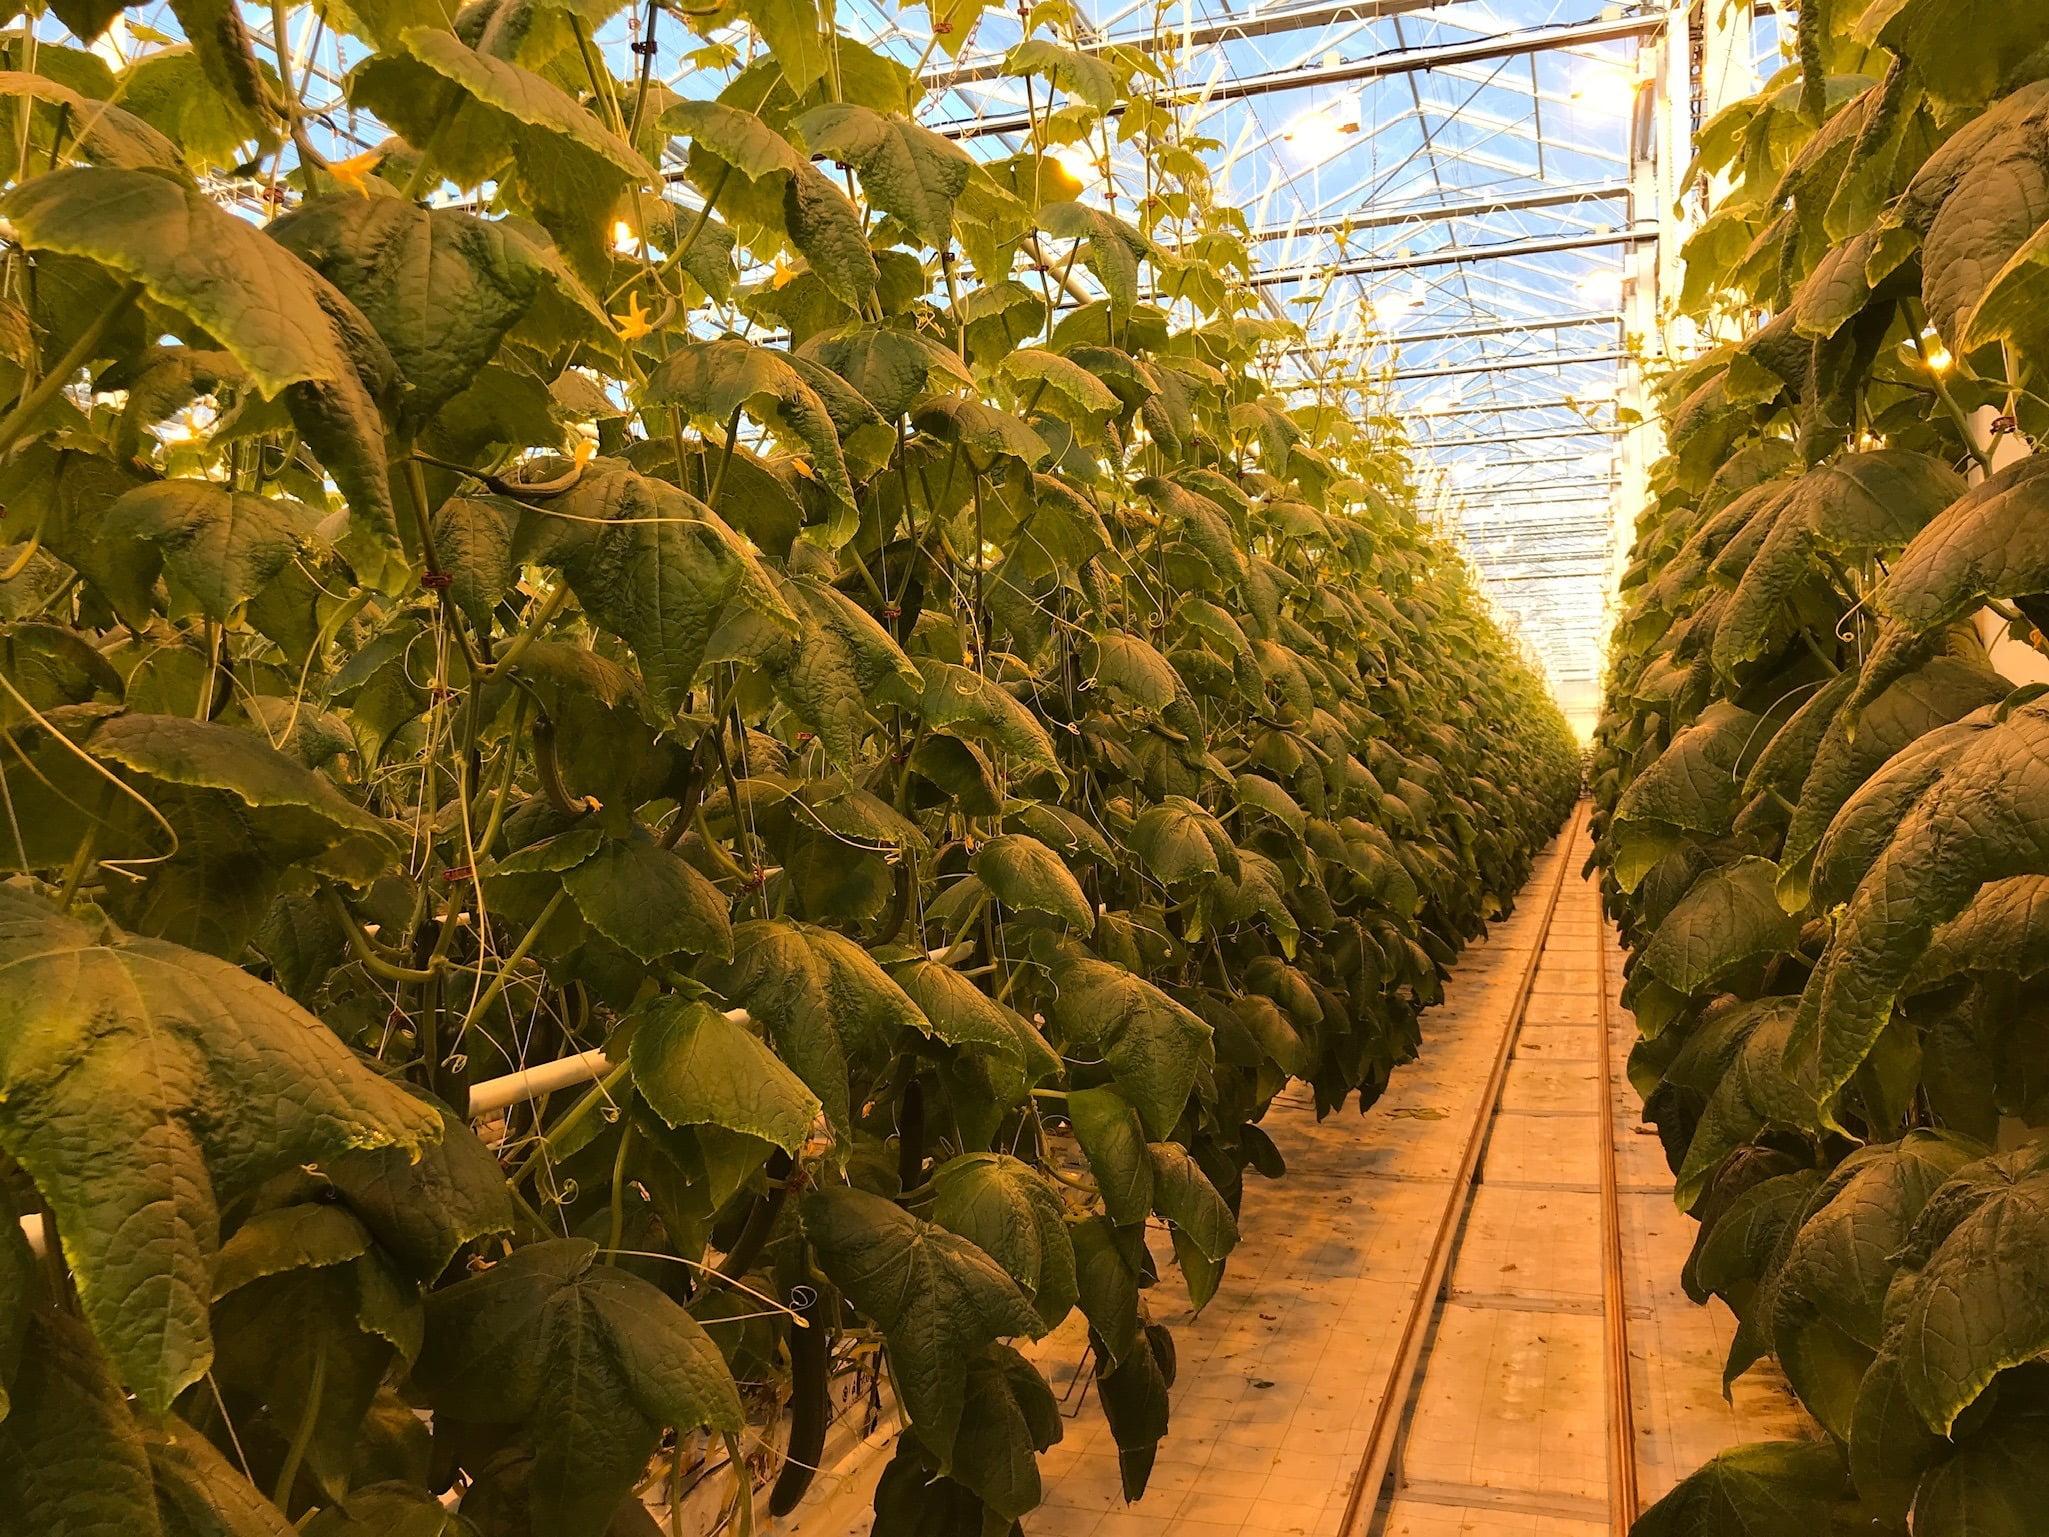 Doef's Greenhouses